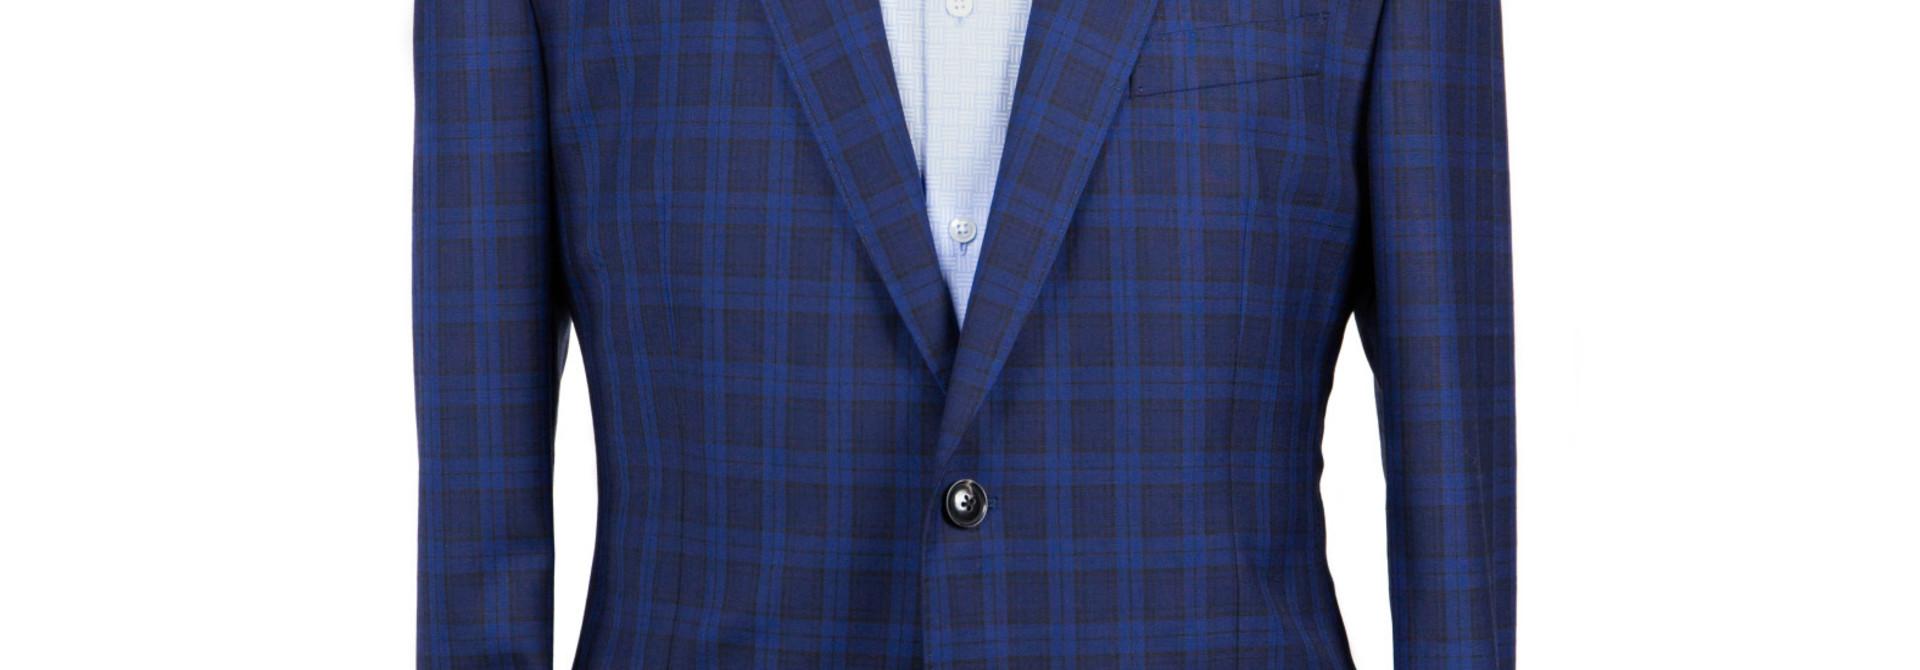 The Lindell Jacket